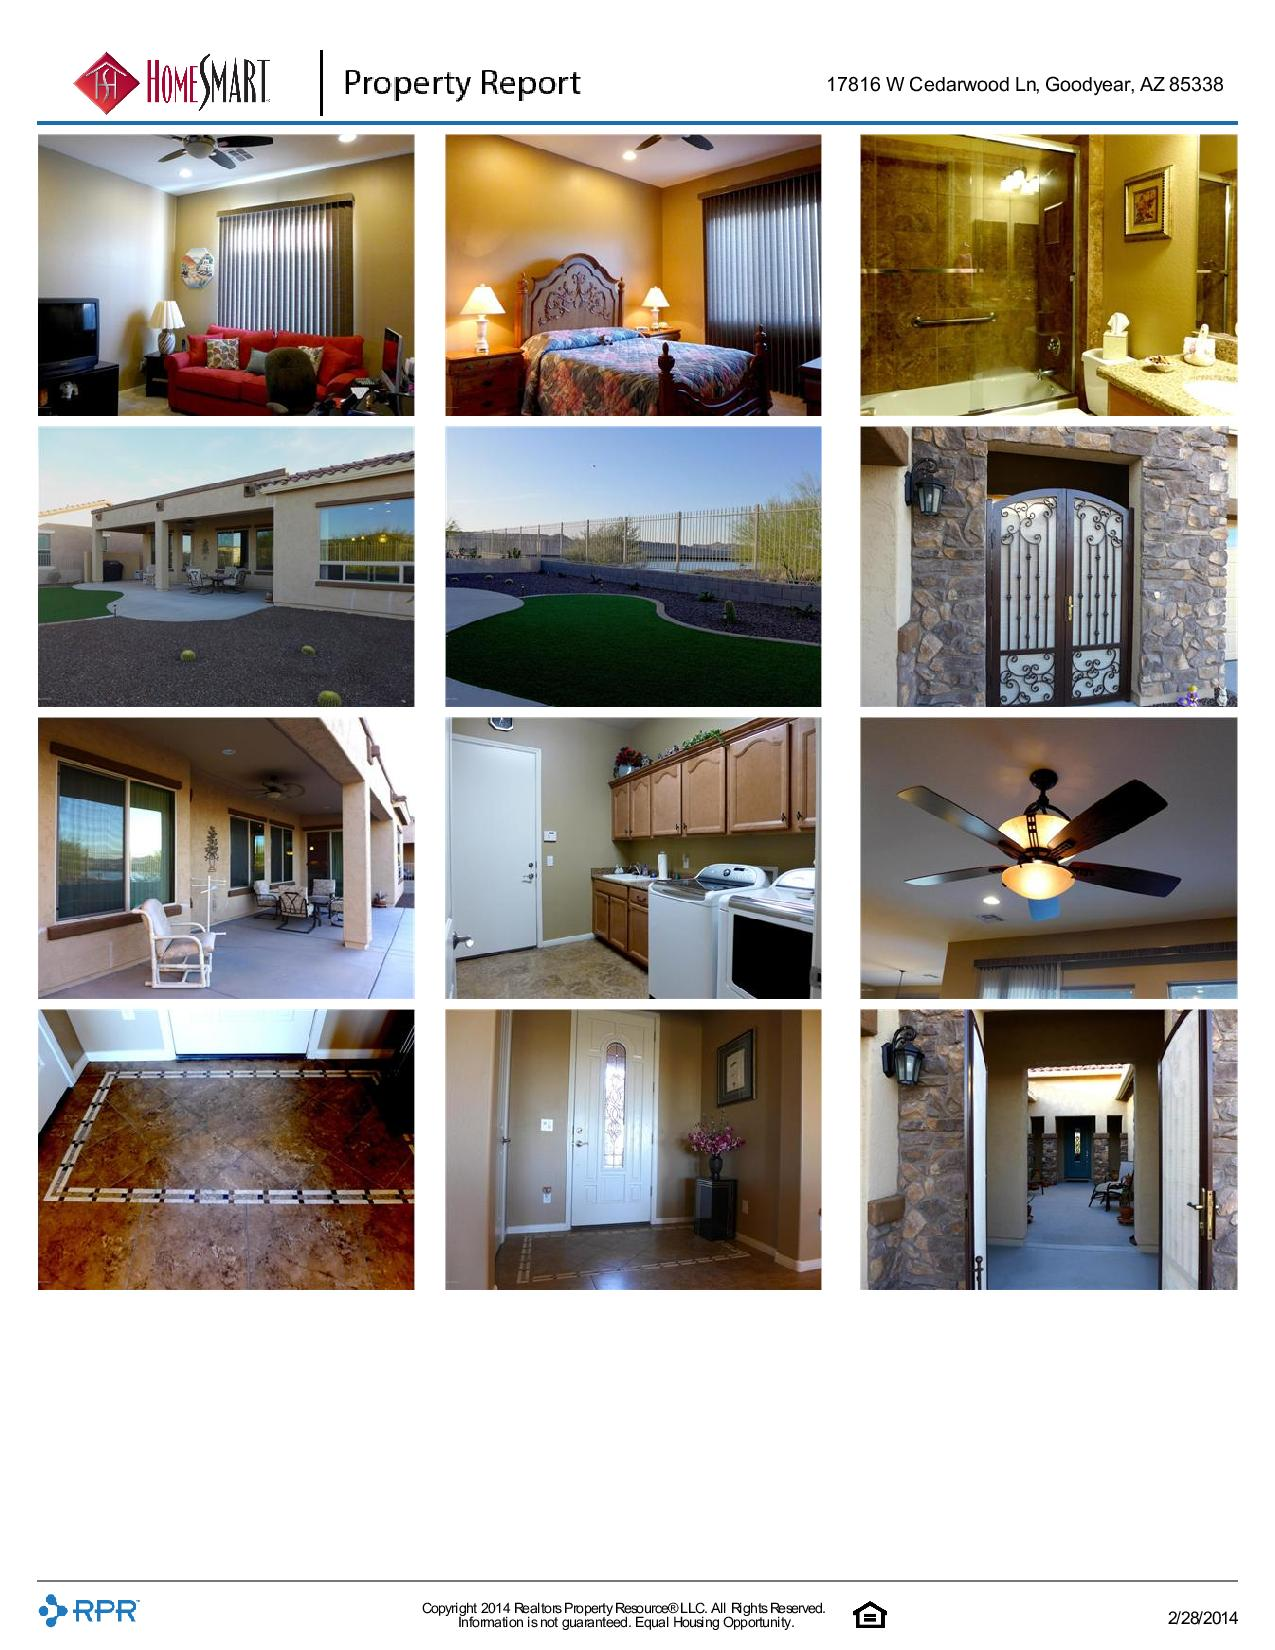 17816-W-Cedarwood-Ln-Goodyear-AZ-85338-page-006